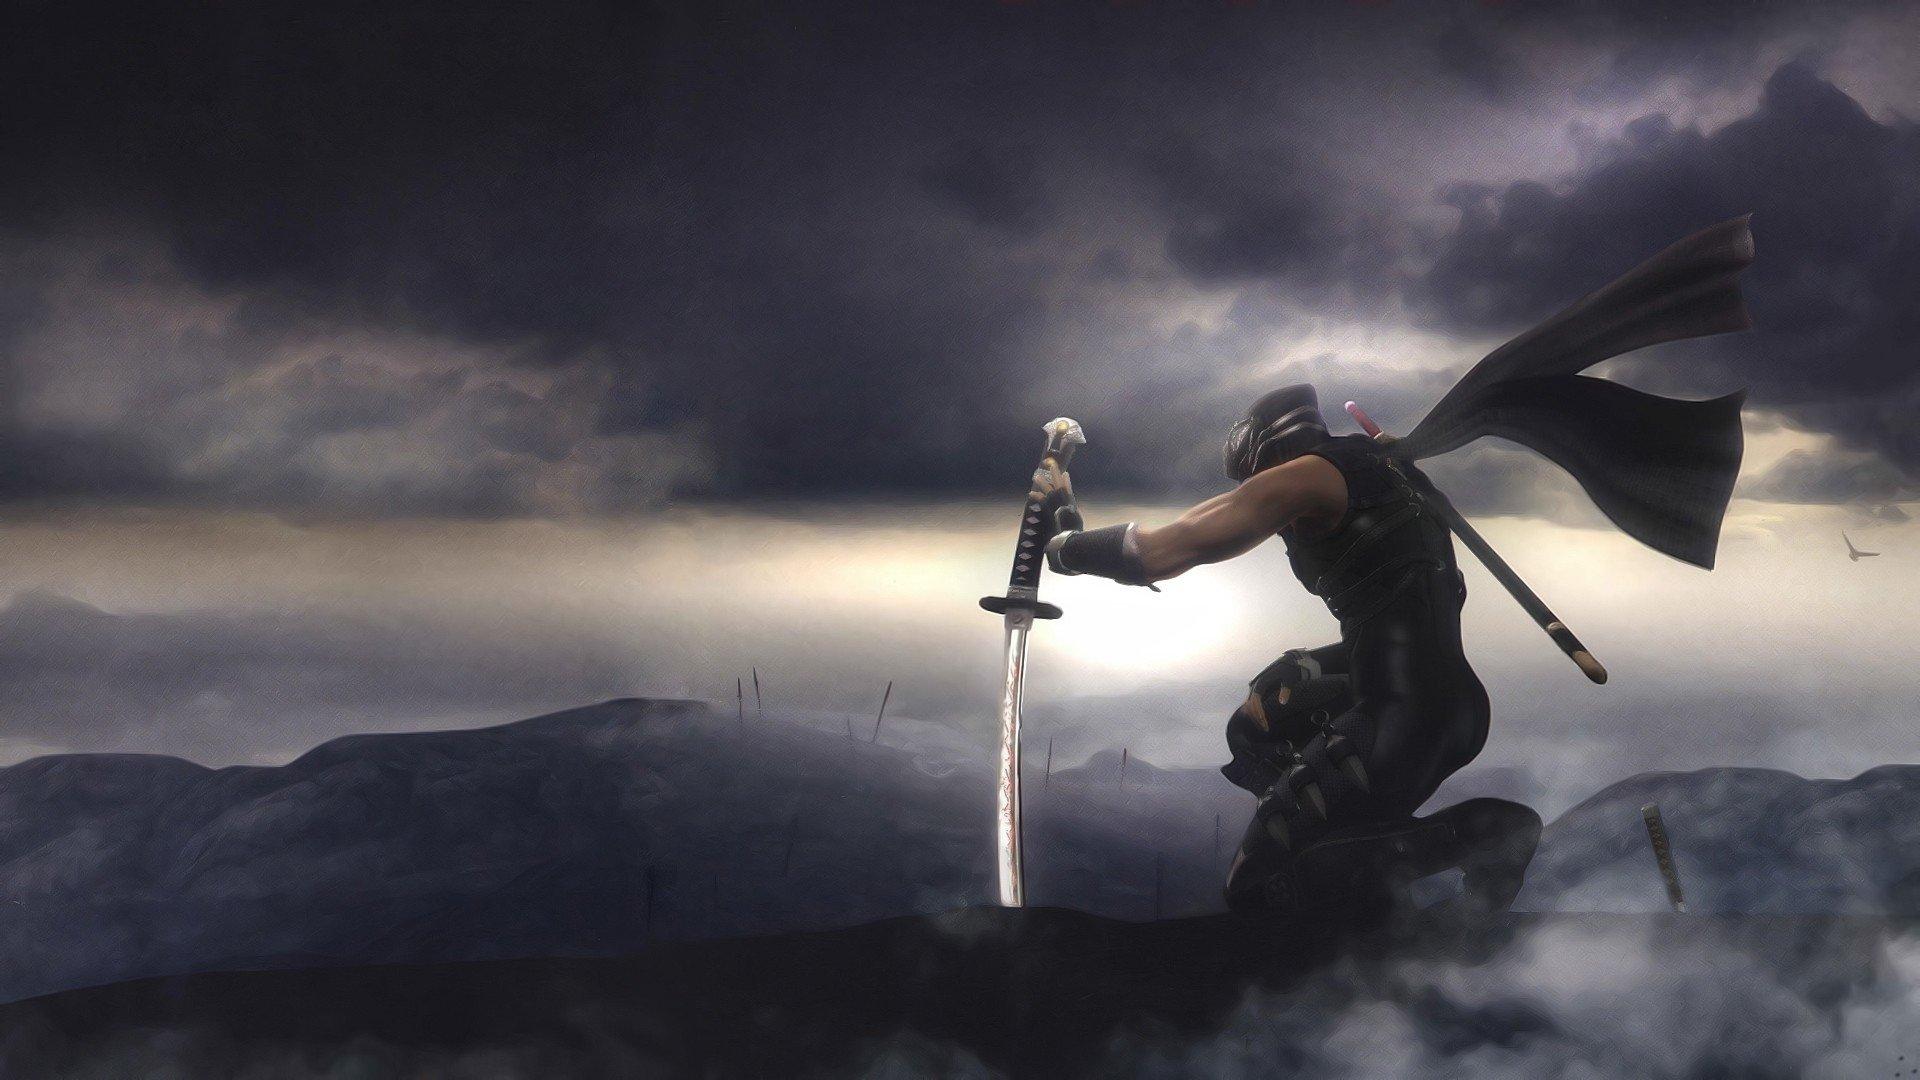 تصویر: https://gamefa.com/wp-content/uploads/2018/06/Ninja-Gaiden-Black.jpg